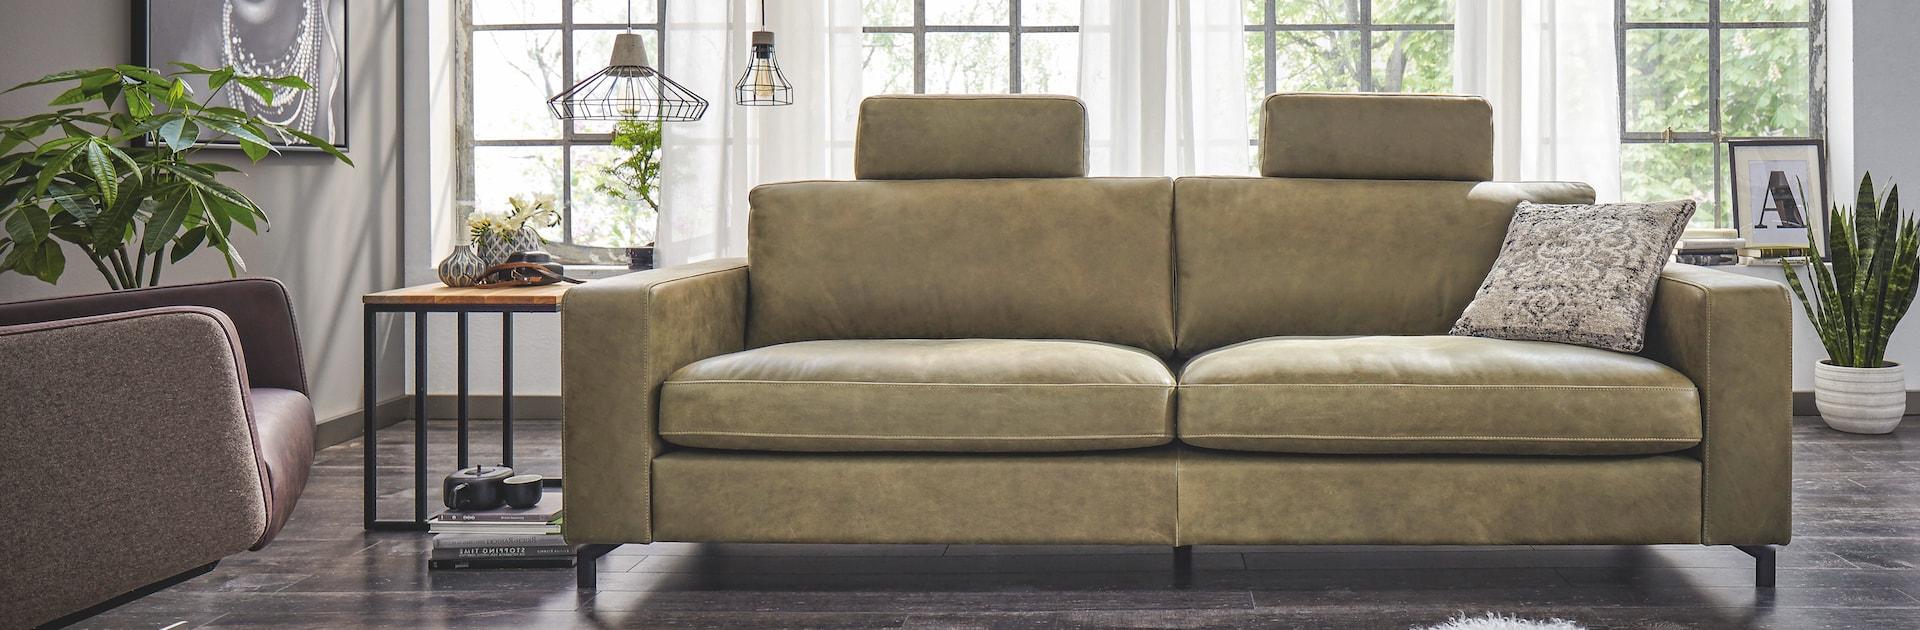 Full Size of Natura Couch Brooklyn Home Sofa Denver Love Newport Kansas Gebraucht Kaufen Wohnen Mit Massivholz Mbel Hensel 3 Teilig Copperfield Relaxfunktion Sitzer Weiches Sofa Natura Sofa